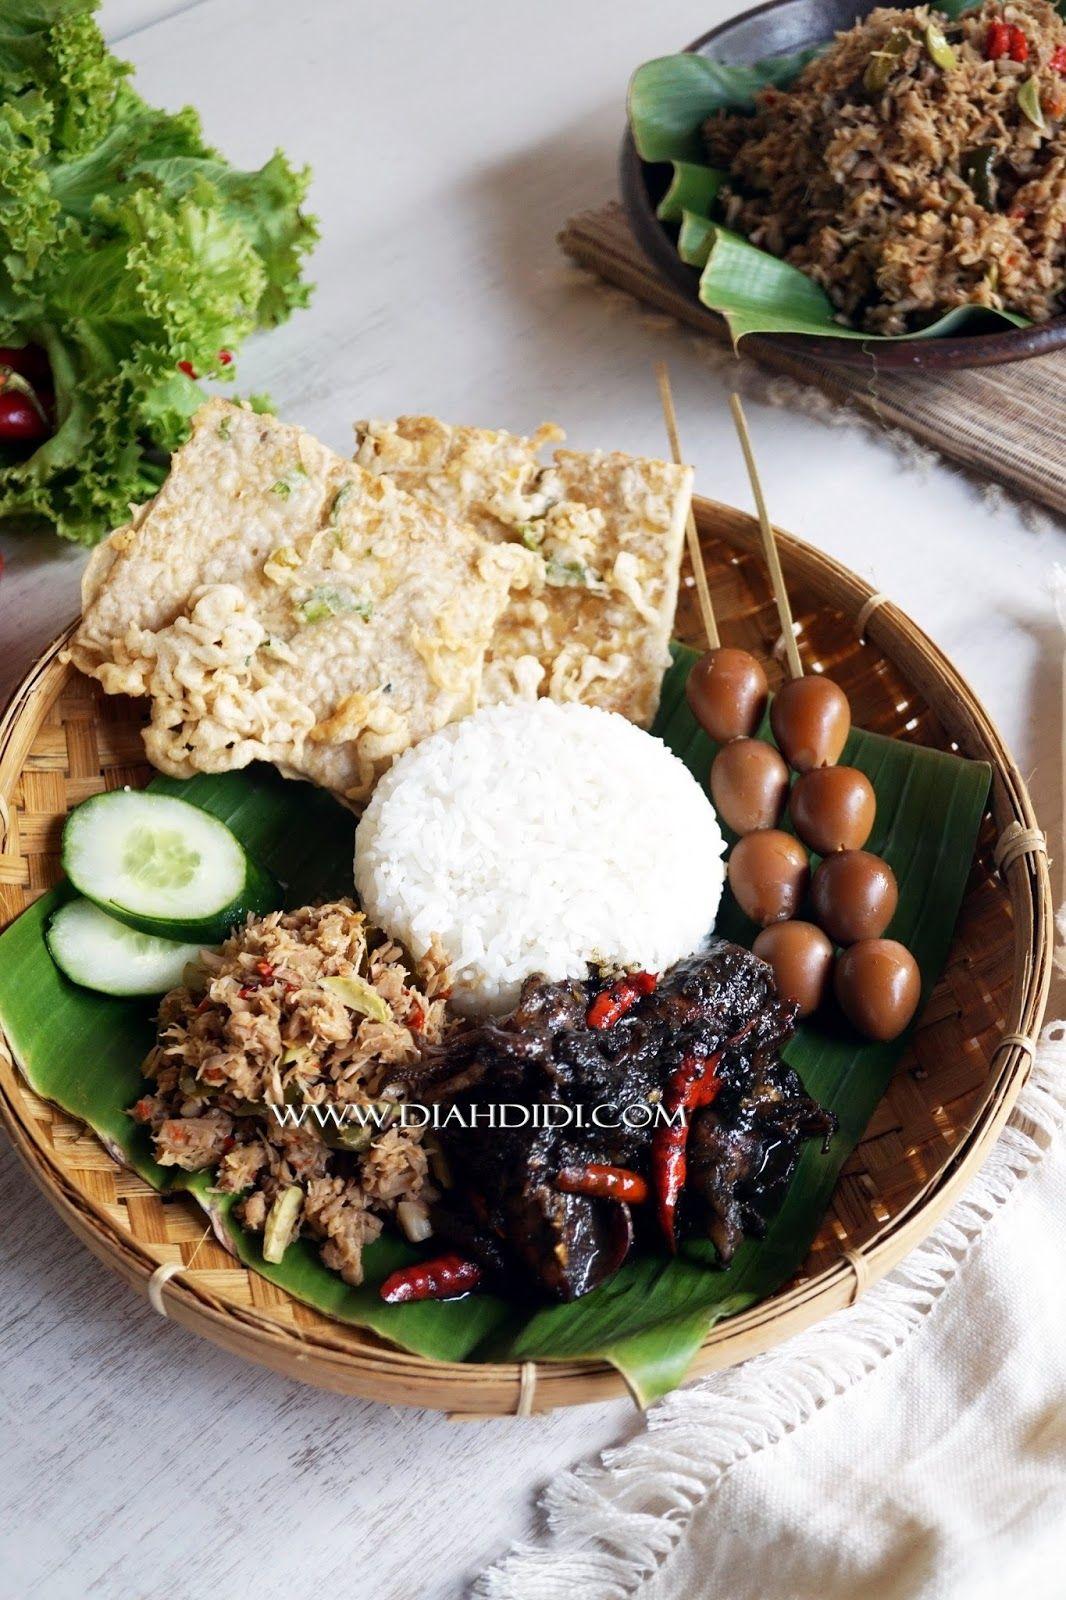 Nasi Megono Pekalongan : megono, pekalongan, Didi's, Kitchen:, Megono, Pekalongan, Resep, Masakan, Indonesia,, Makanan, Minuman,